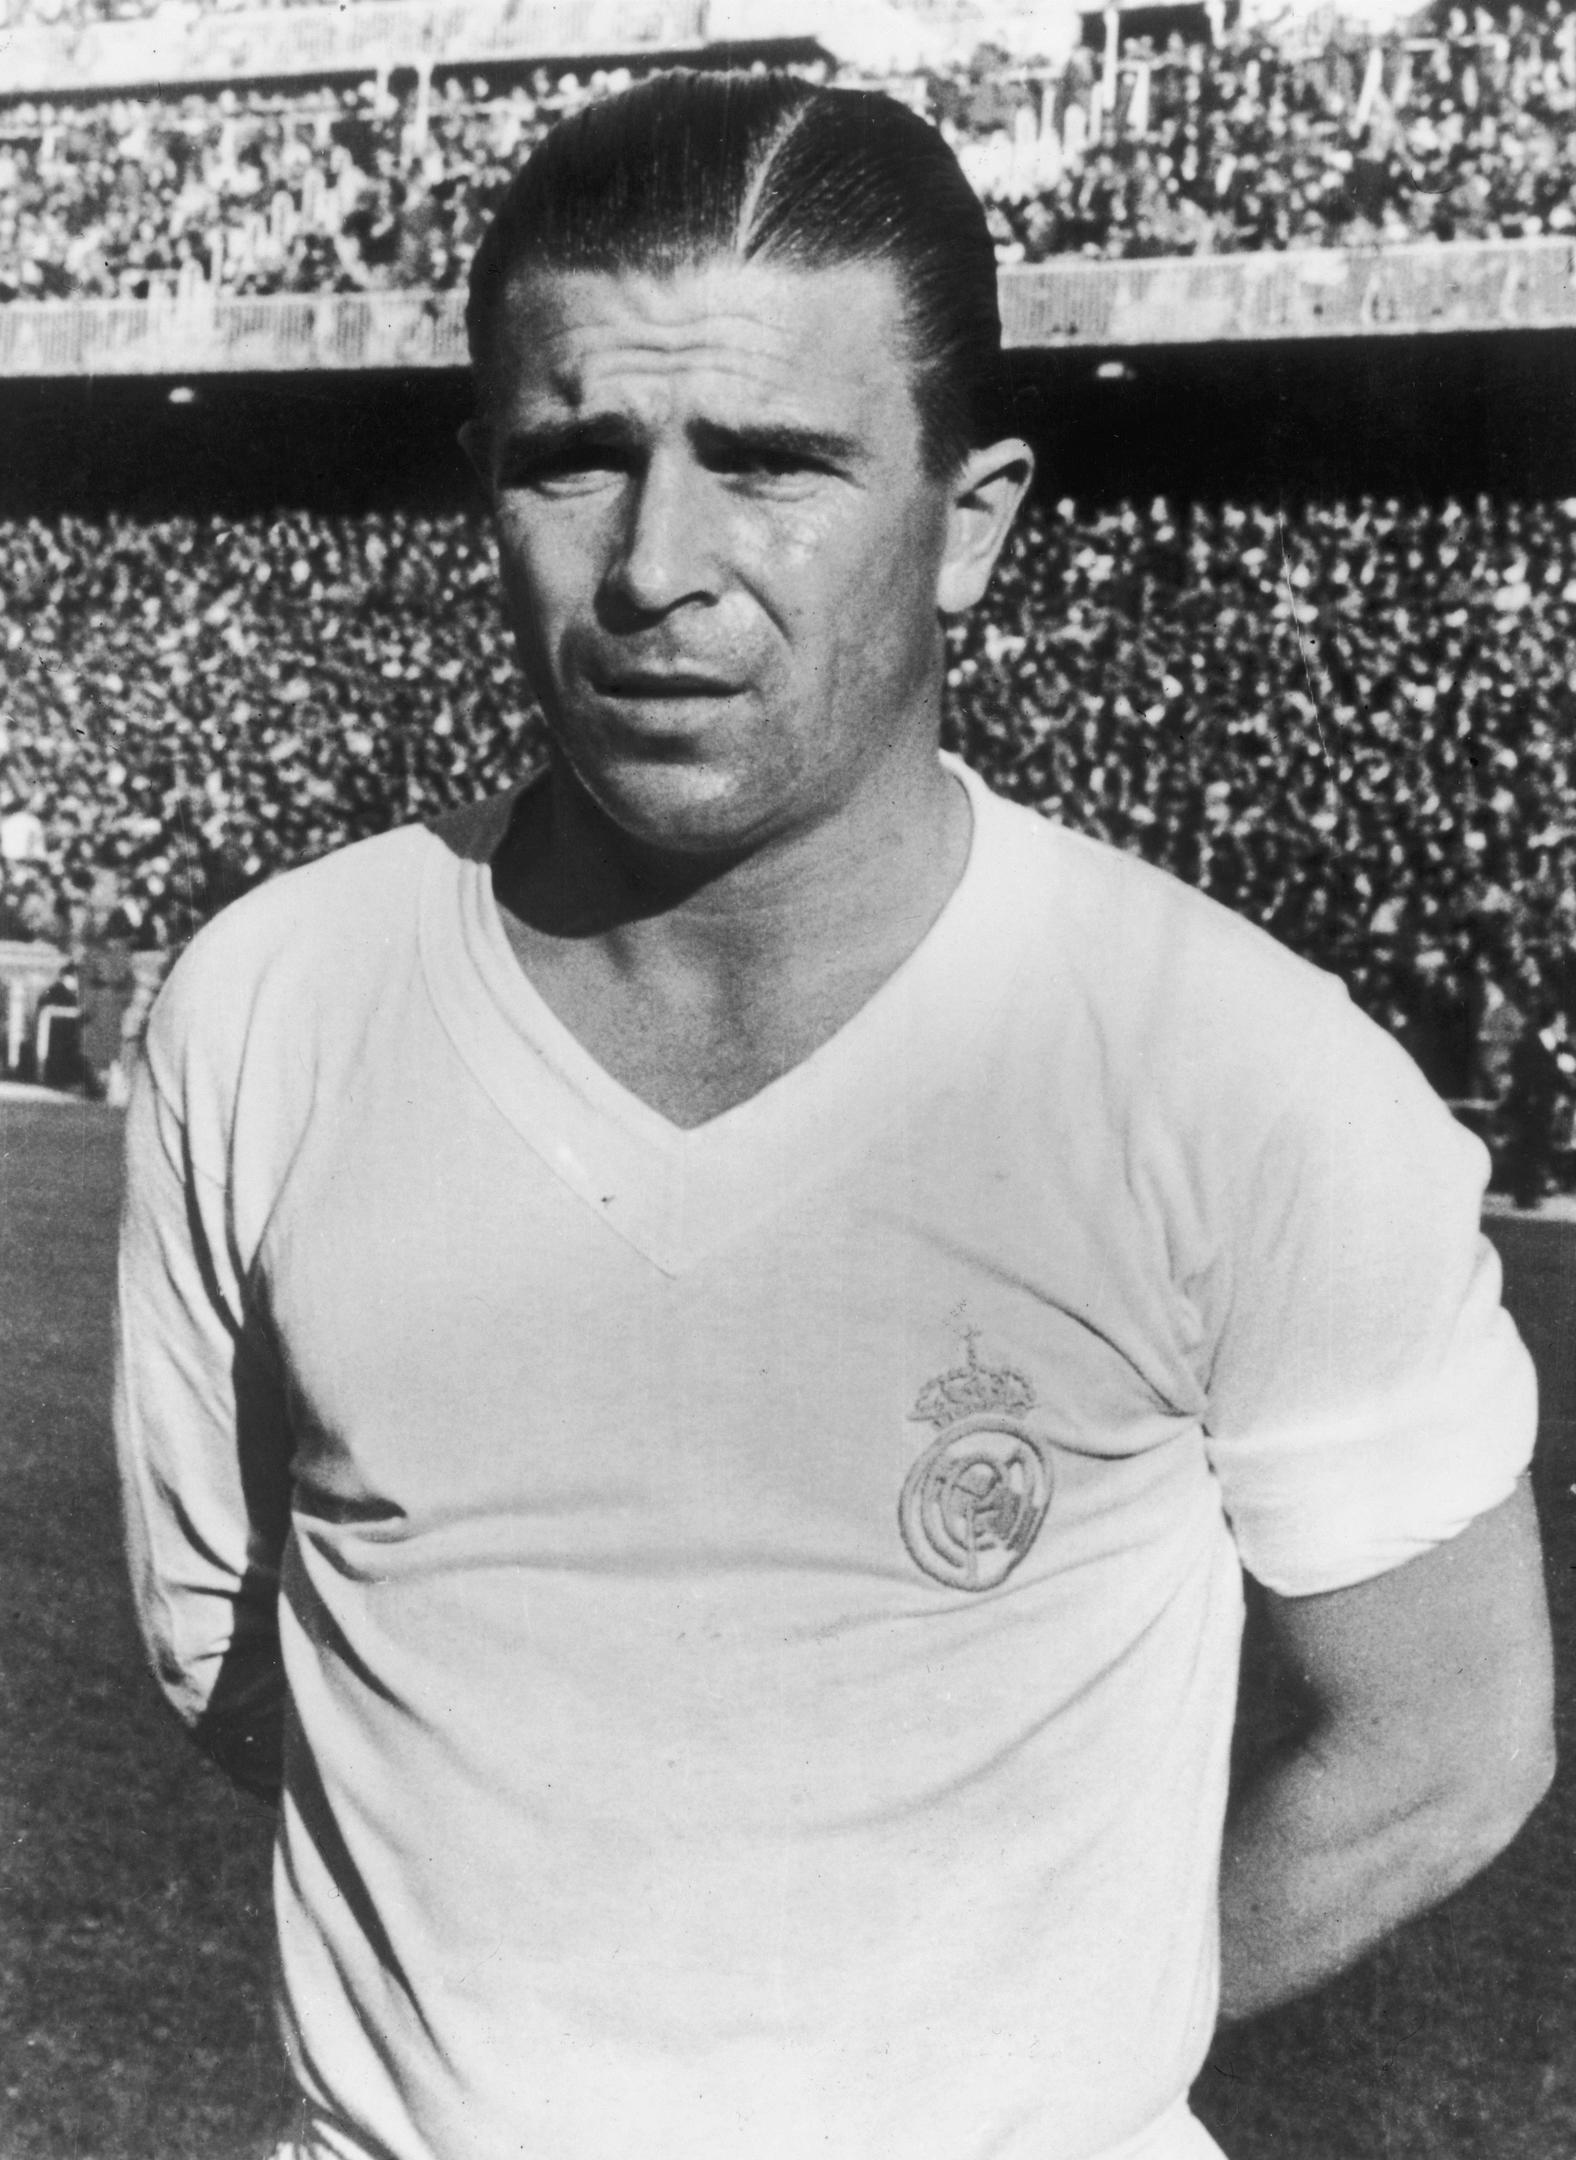 Hungarian footballer Ferenc Puskas